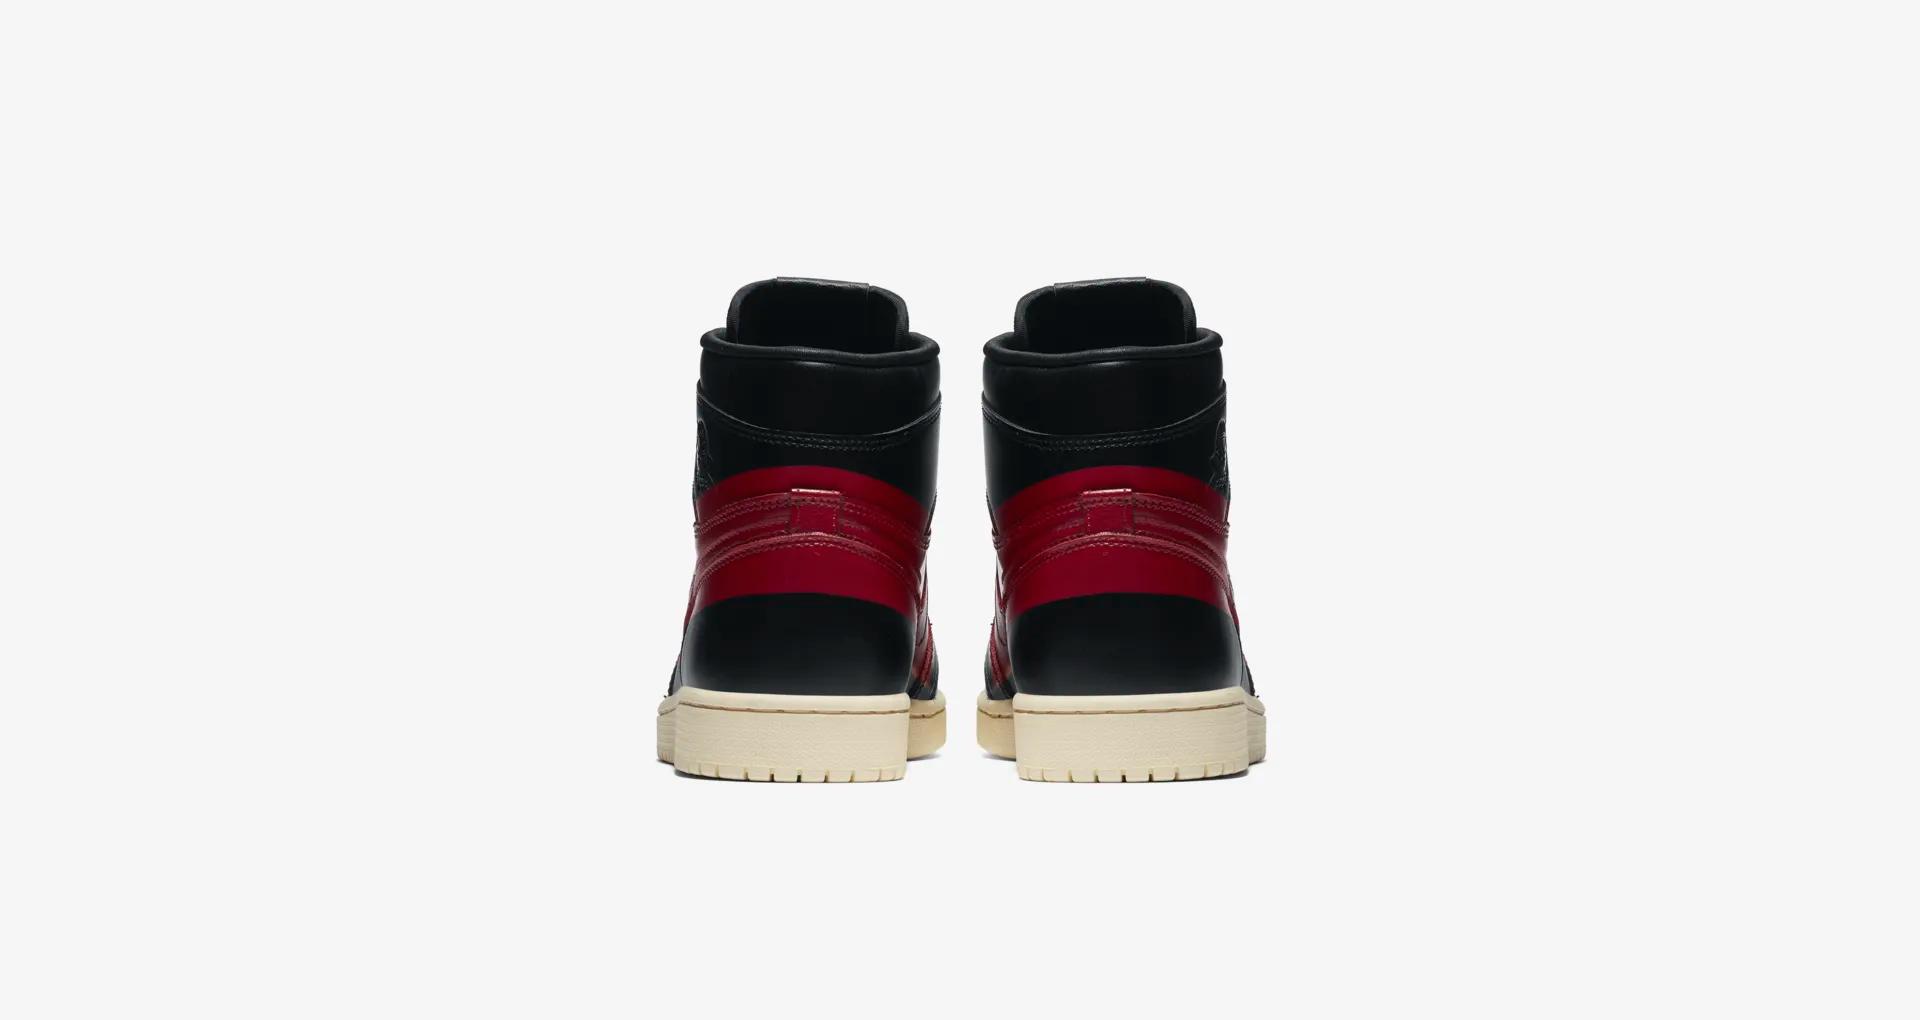 BQ6682 006 Air Jordan 1 High OG Couture 5